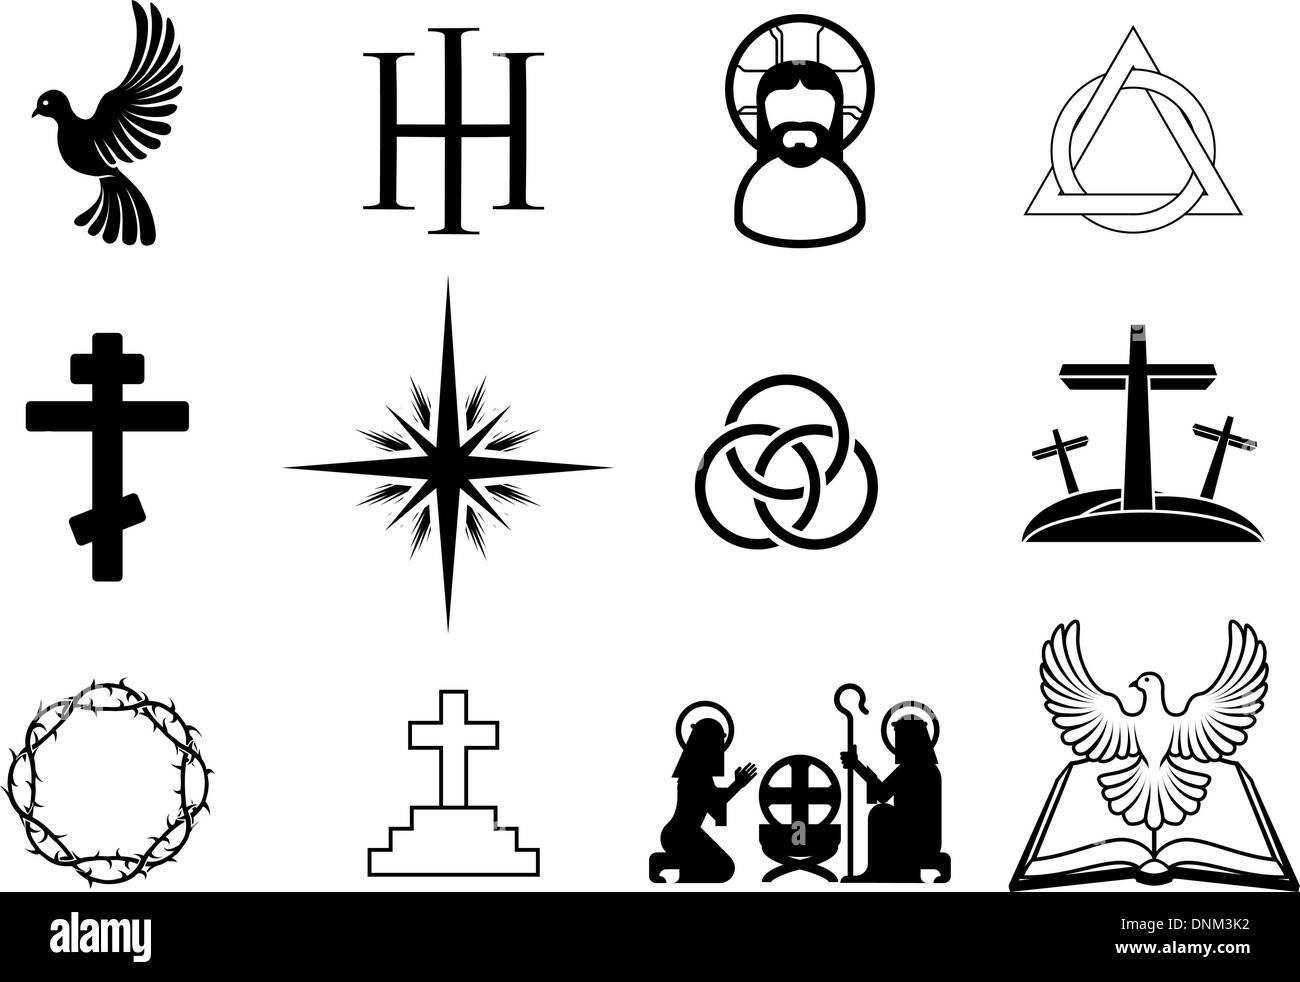 Christogram christianity stock photos christogram christianity a set of christian religious signs and symbols stock image biocorpaavc